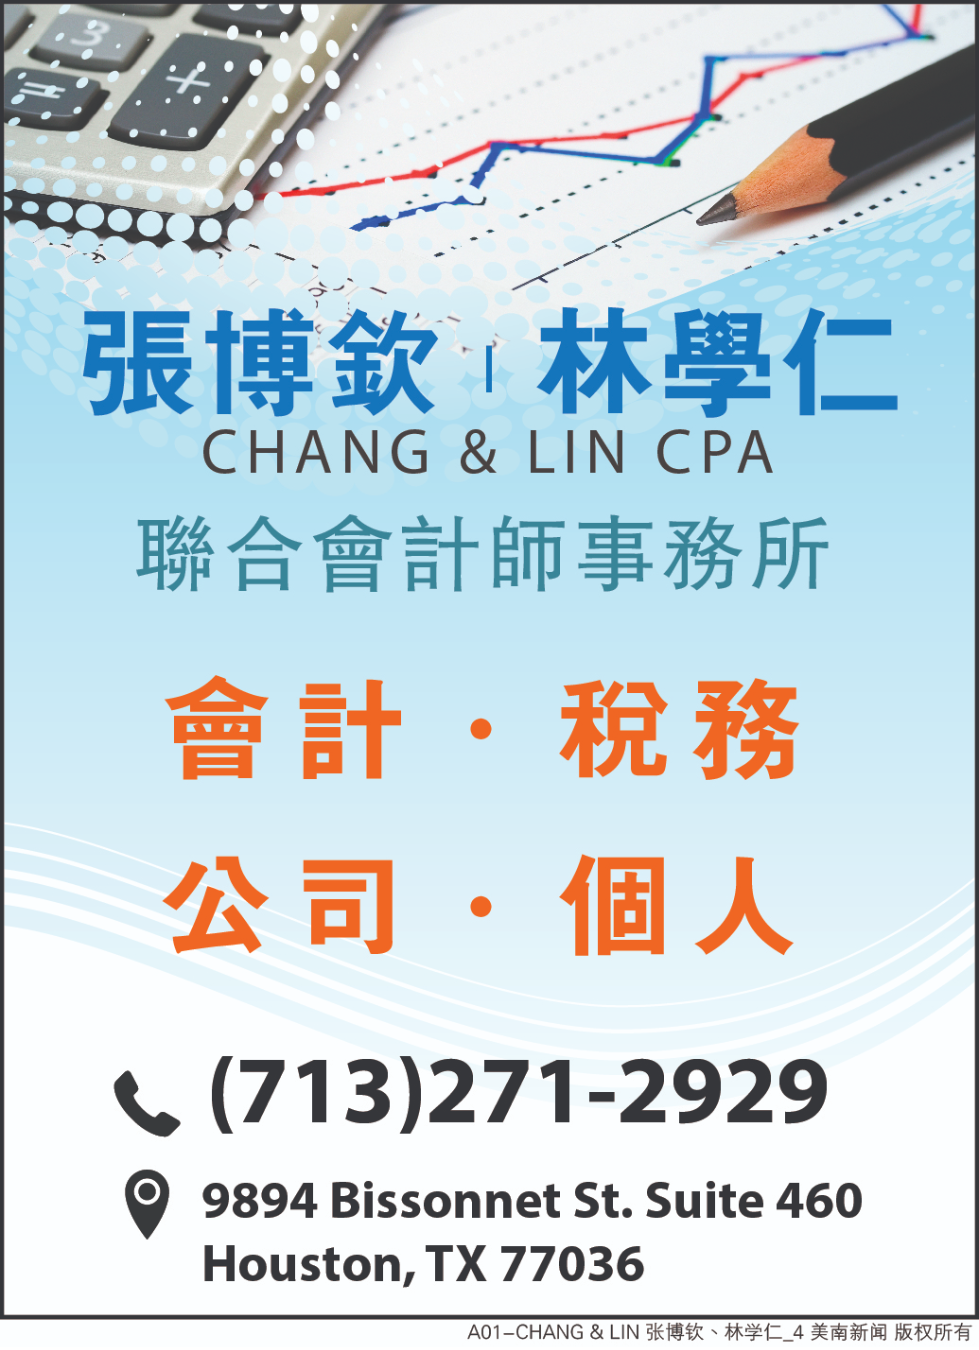 CHANG & LIN CPA 张博钦、林学仁联合会计师事务所